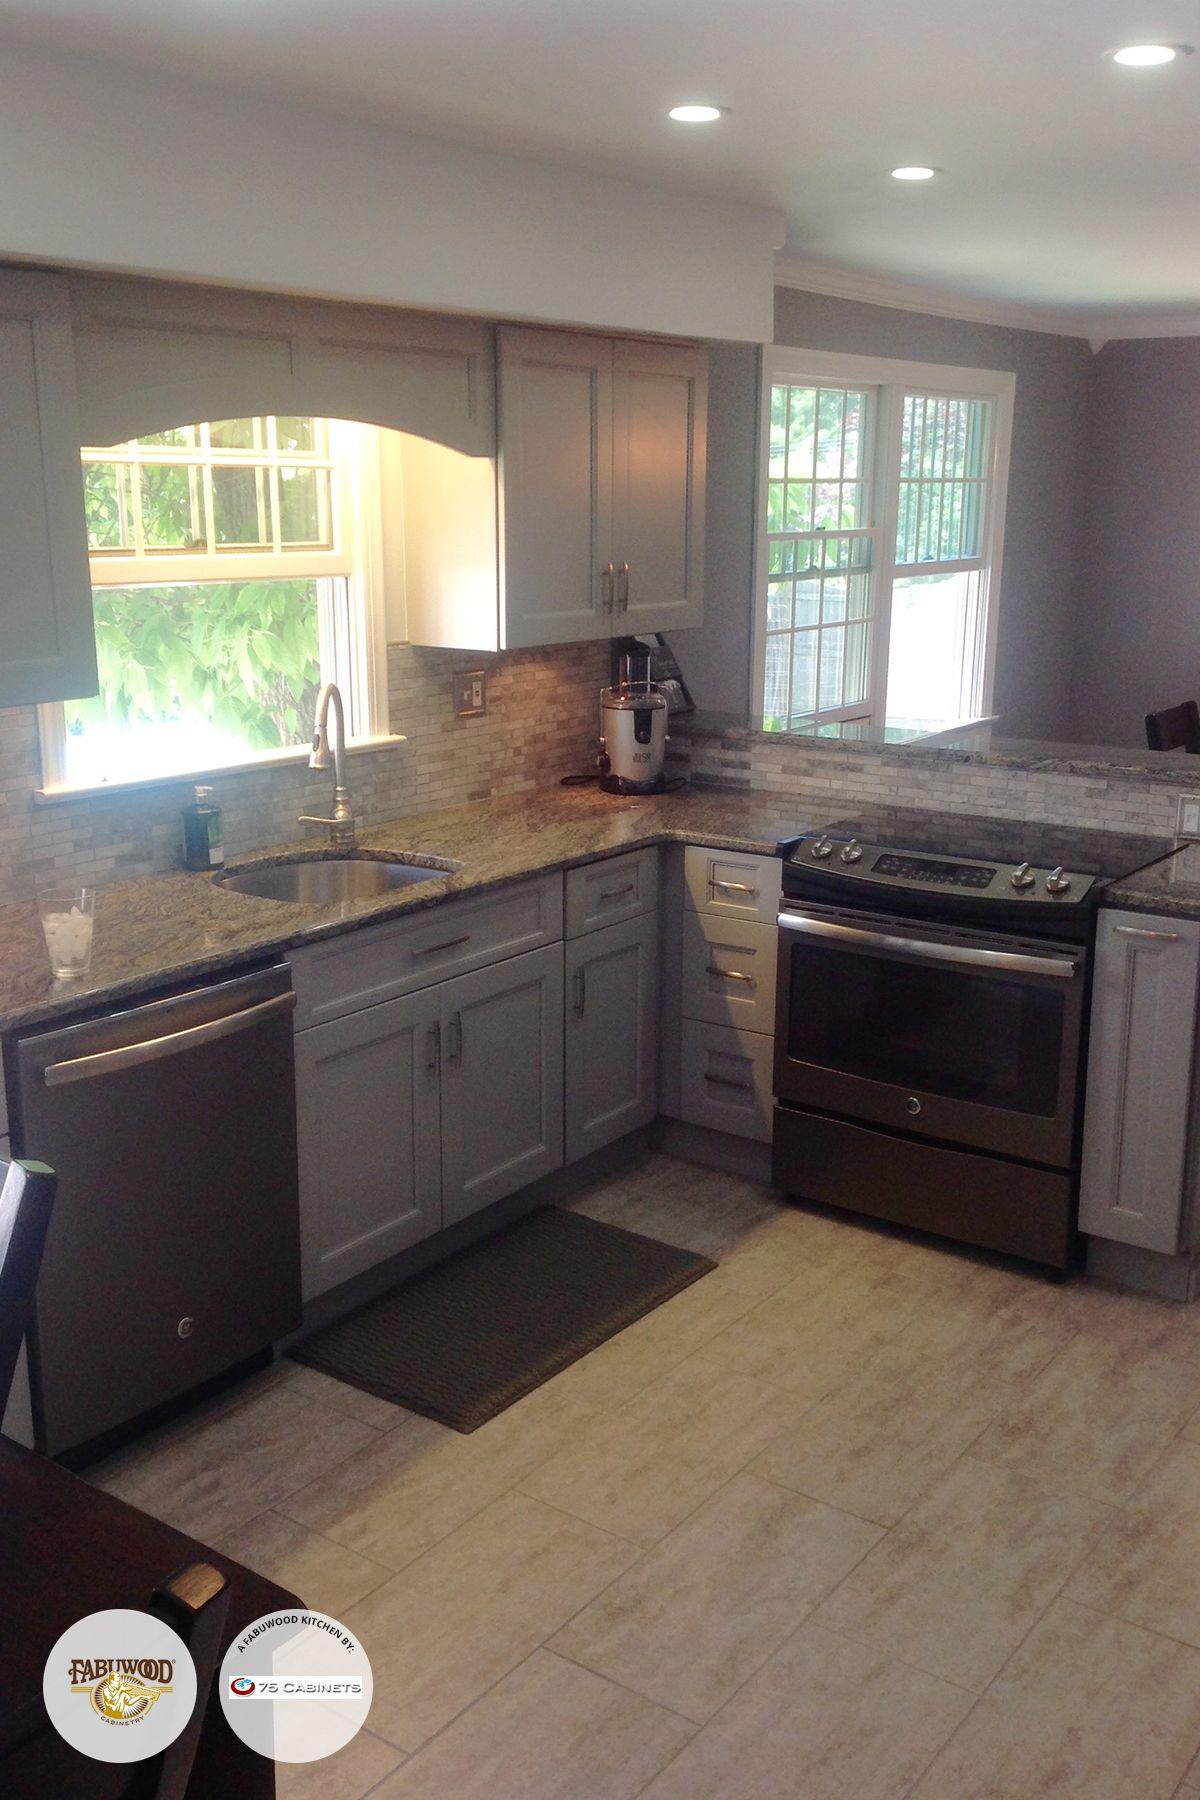 fabuwood kitchen bath cabinet large and inc cabinets elite design cfm